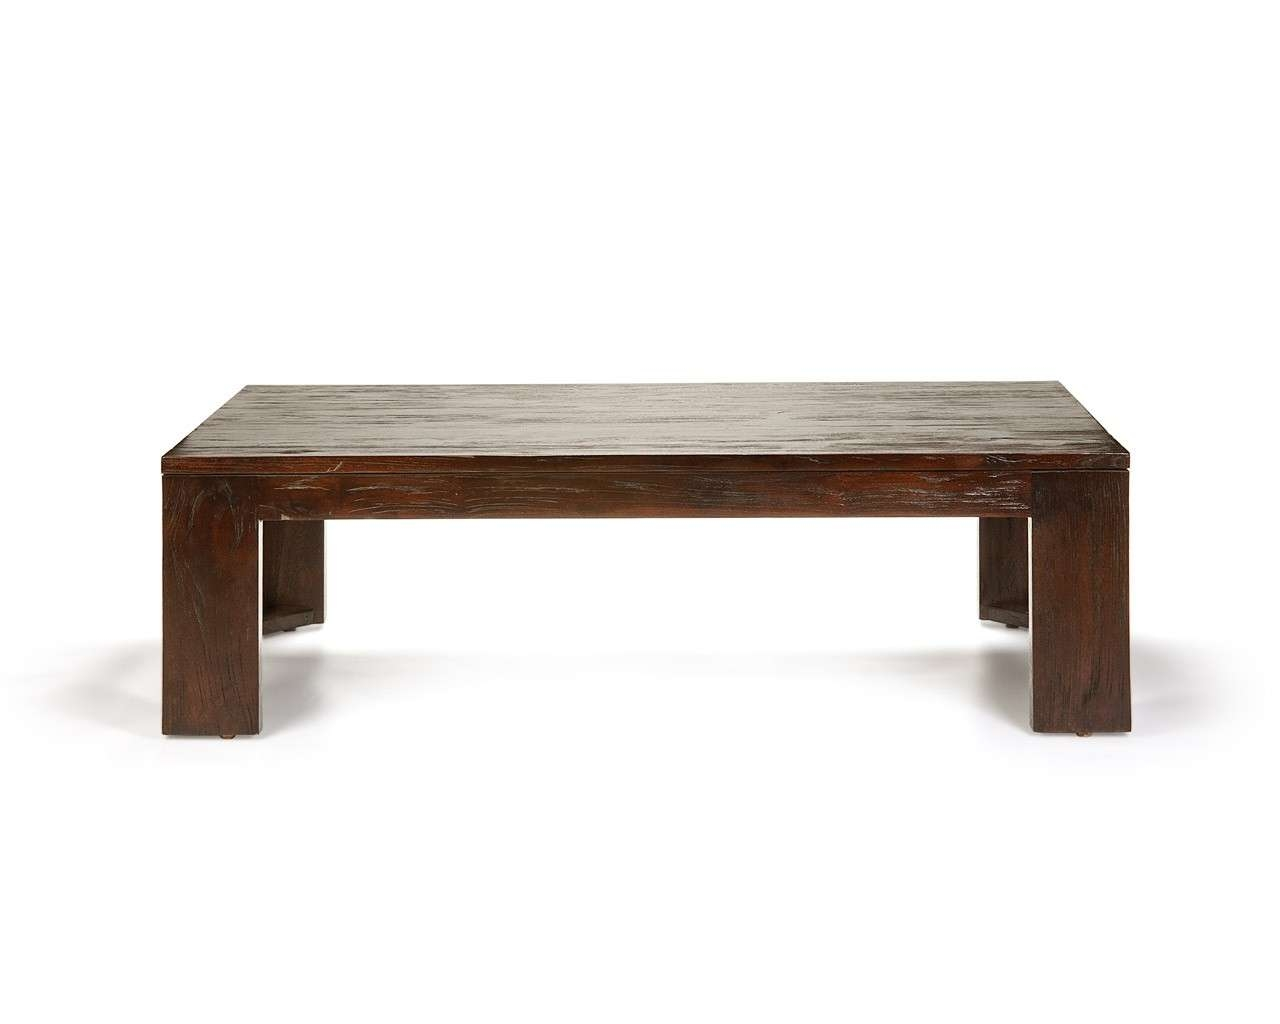 Coffee Tables Ideas: Vintage Motifs Dark Wood Coffee Tables Regarding Trendy Dark Wooden Coffee Tables (View 2 of 20)